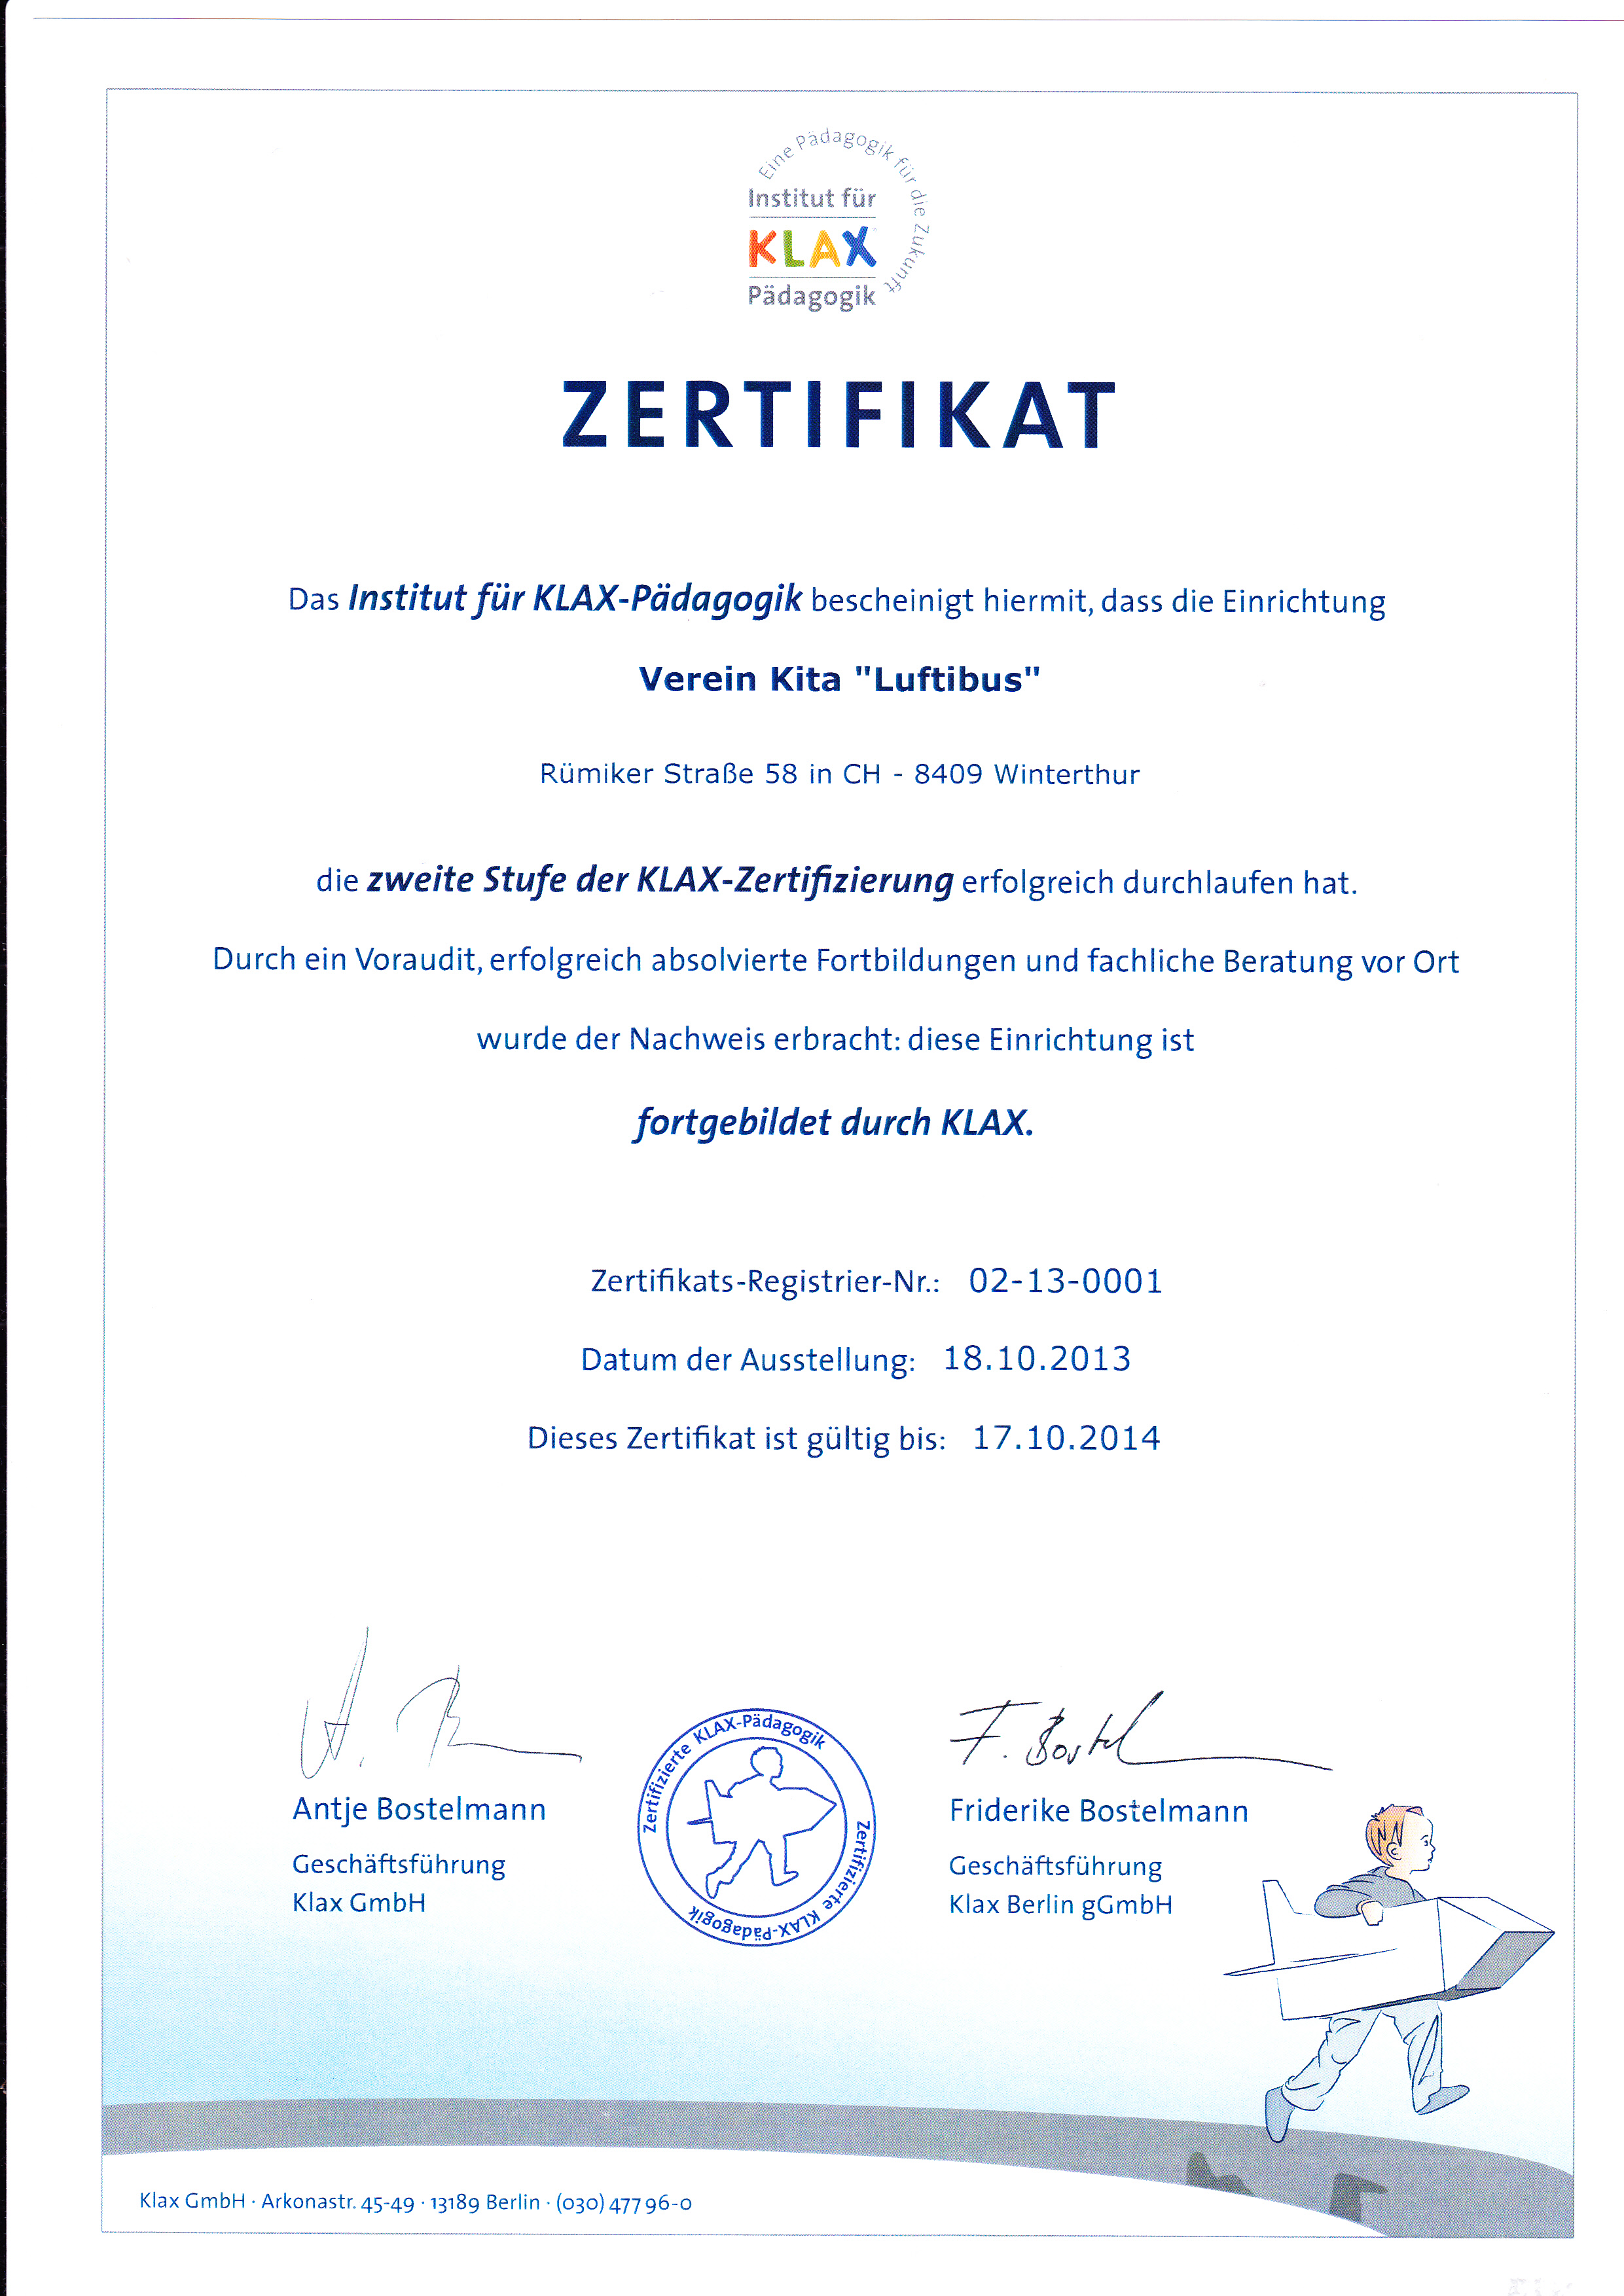 KLAX-Zertifizierung